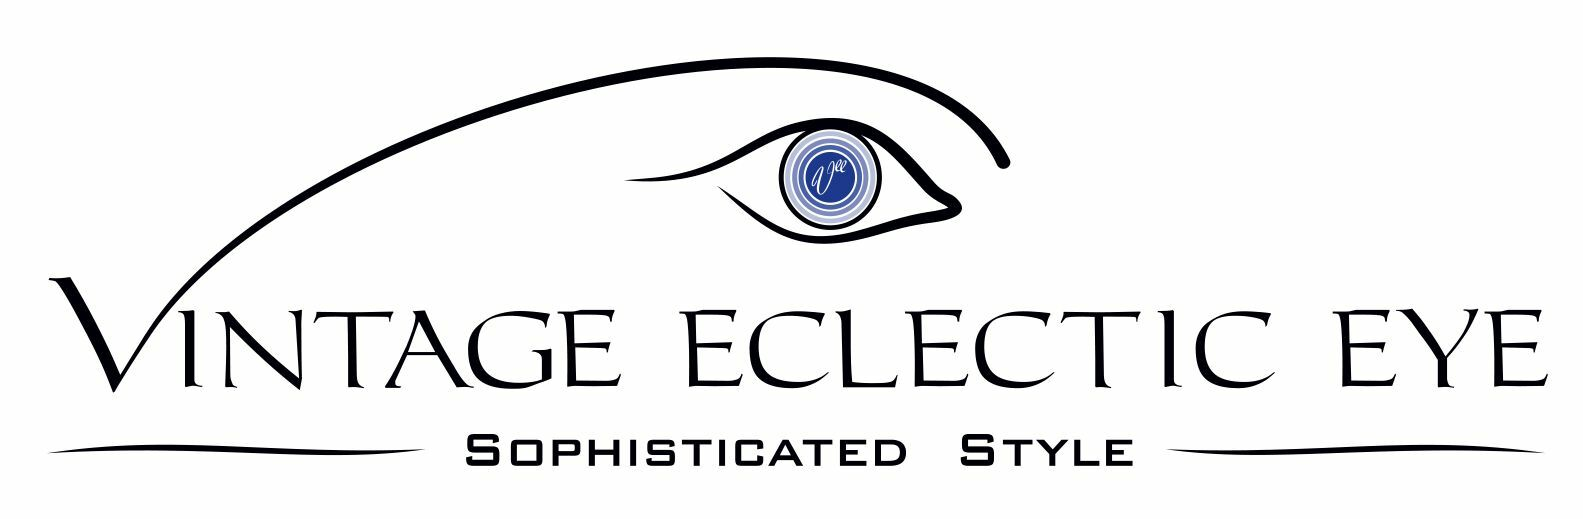 Vintage Eclectic Eye